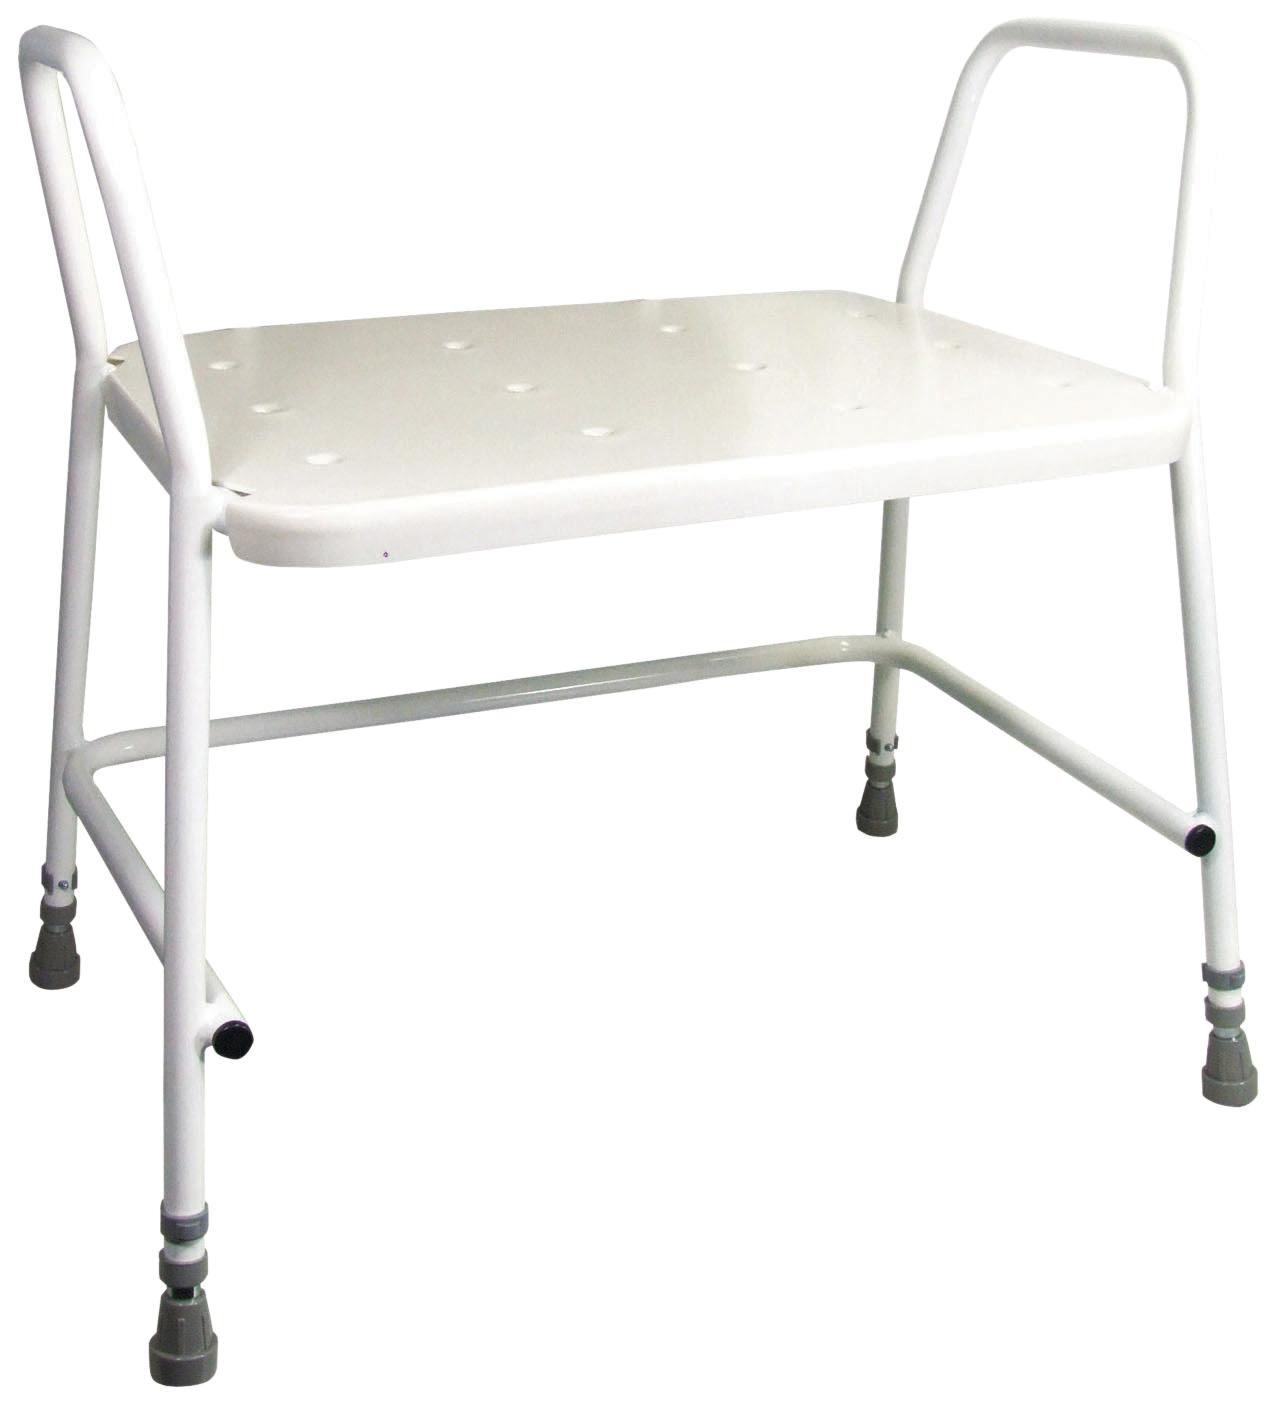 Bariatric Height Adjustable Shower Stool